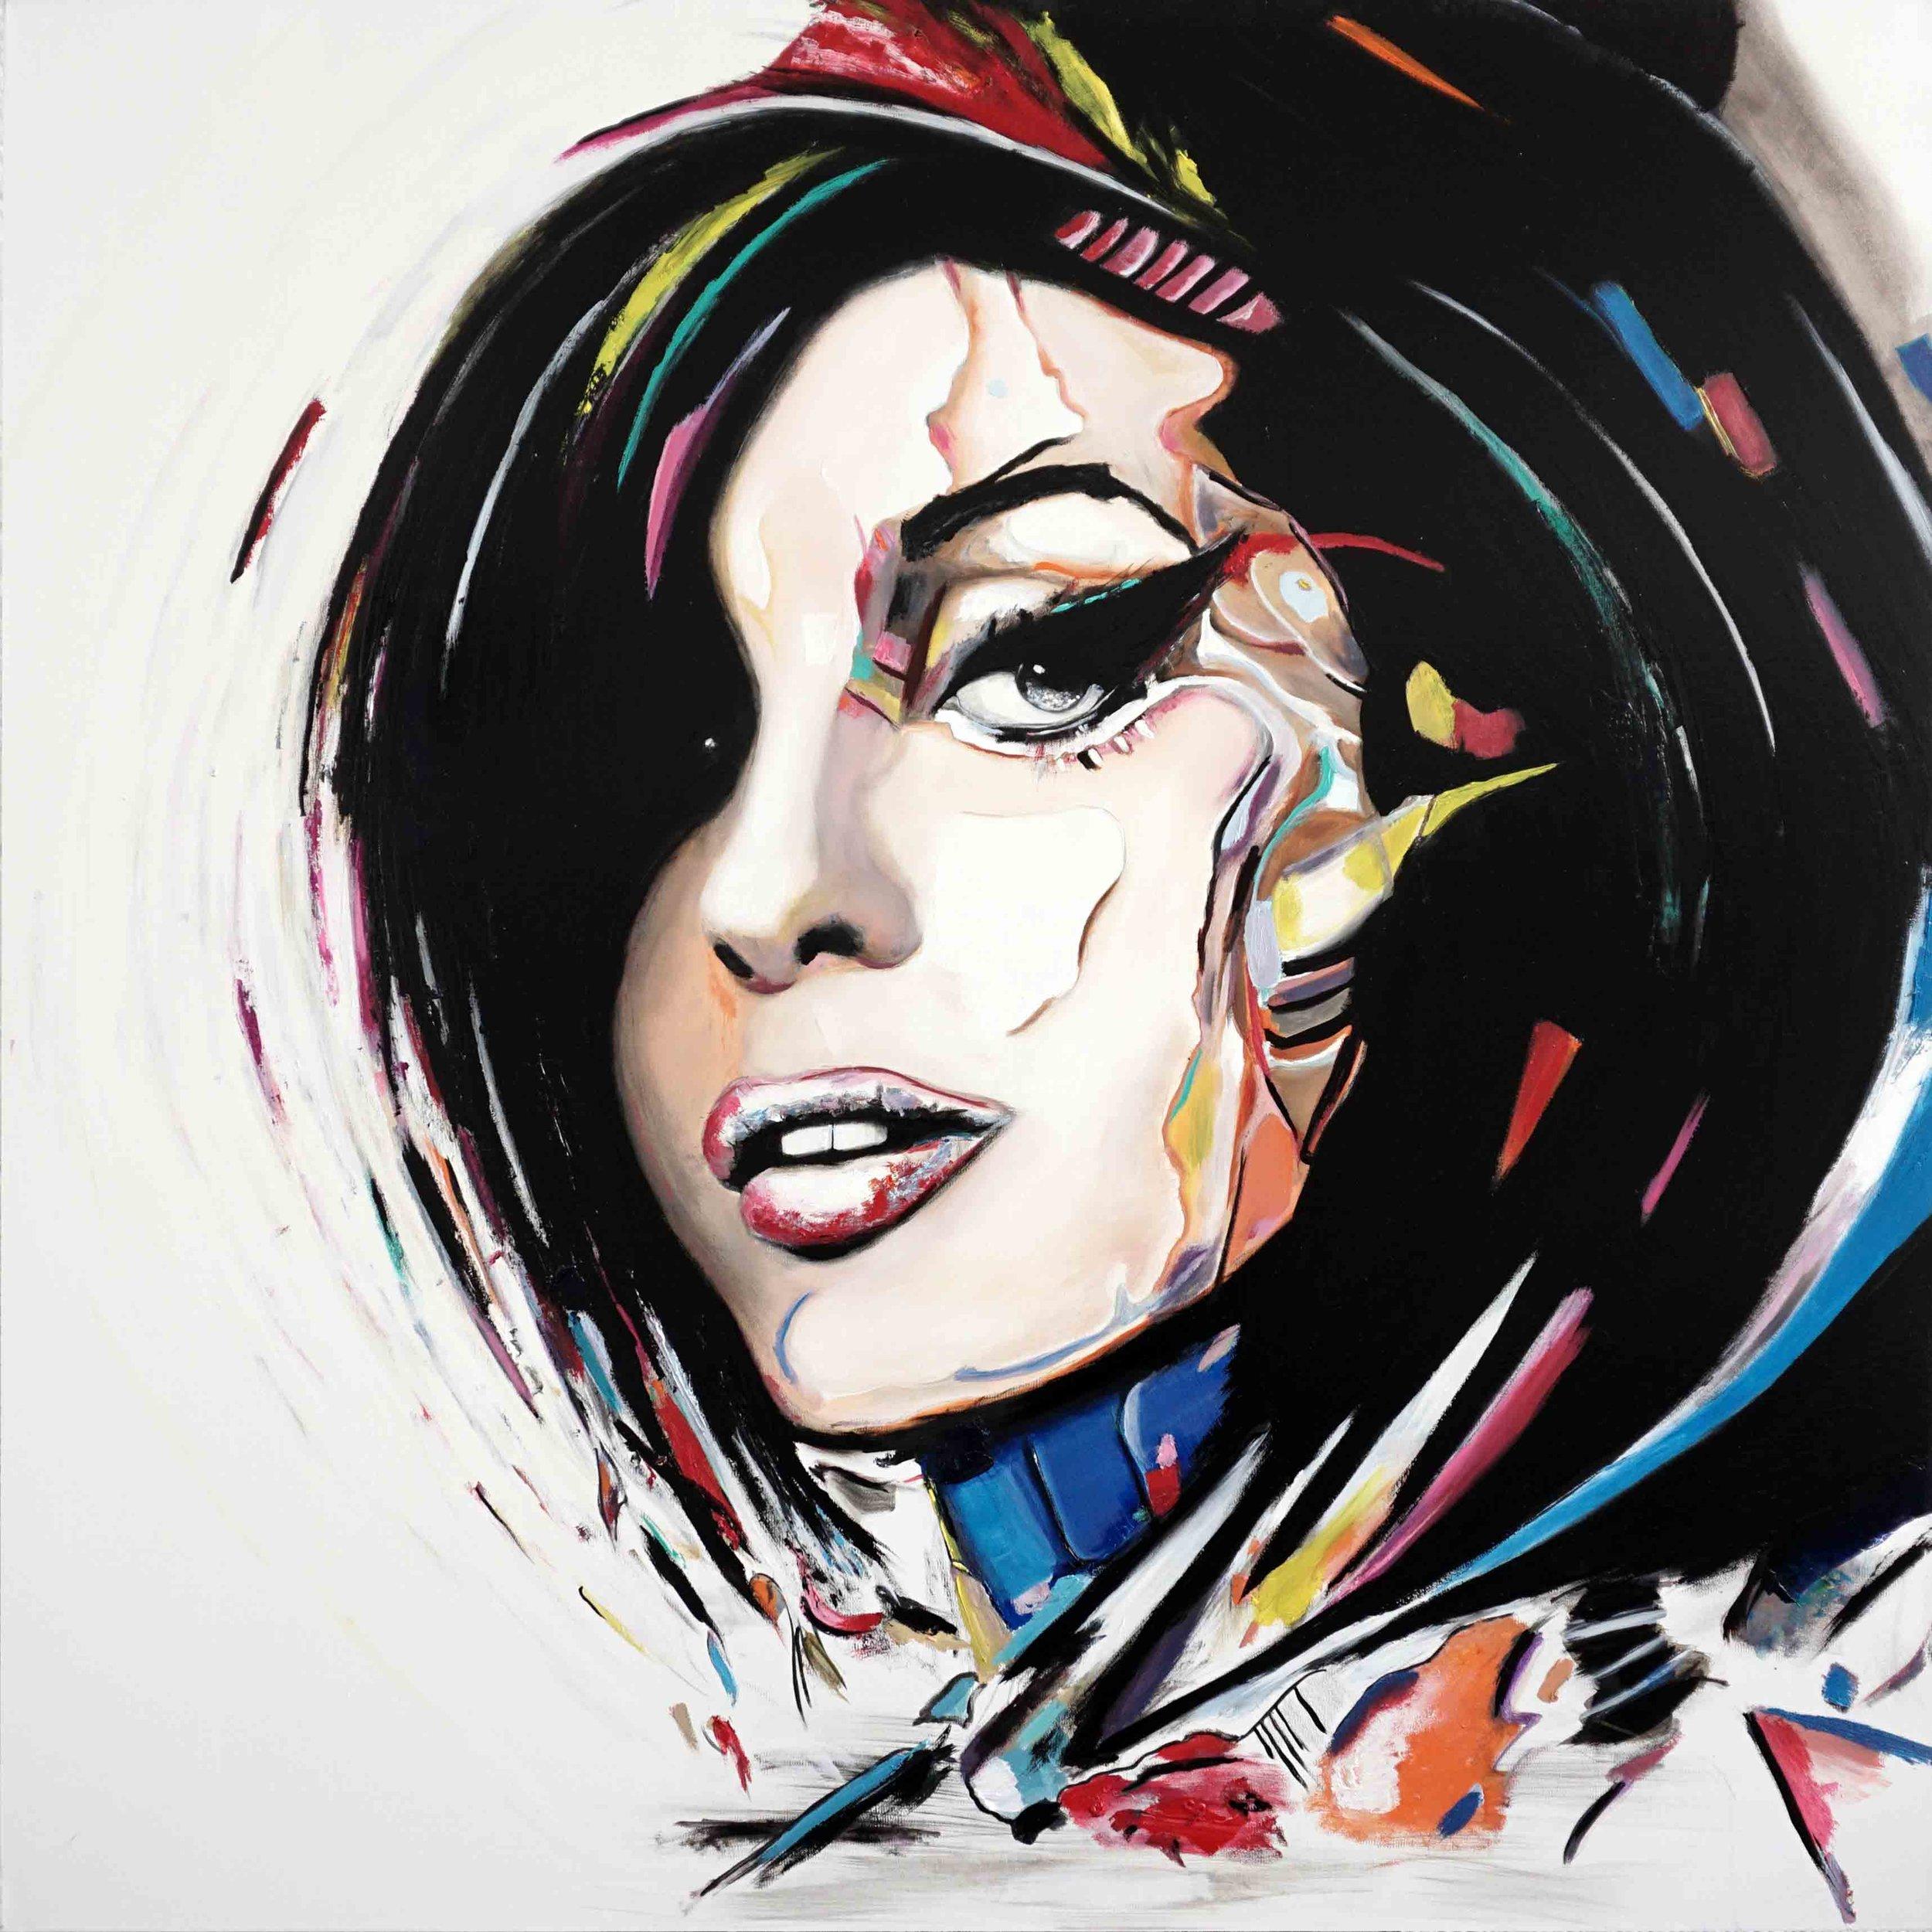 Amy Winehouse - by Jc Trouboul